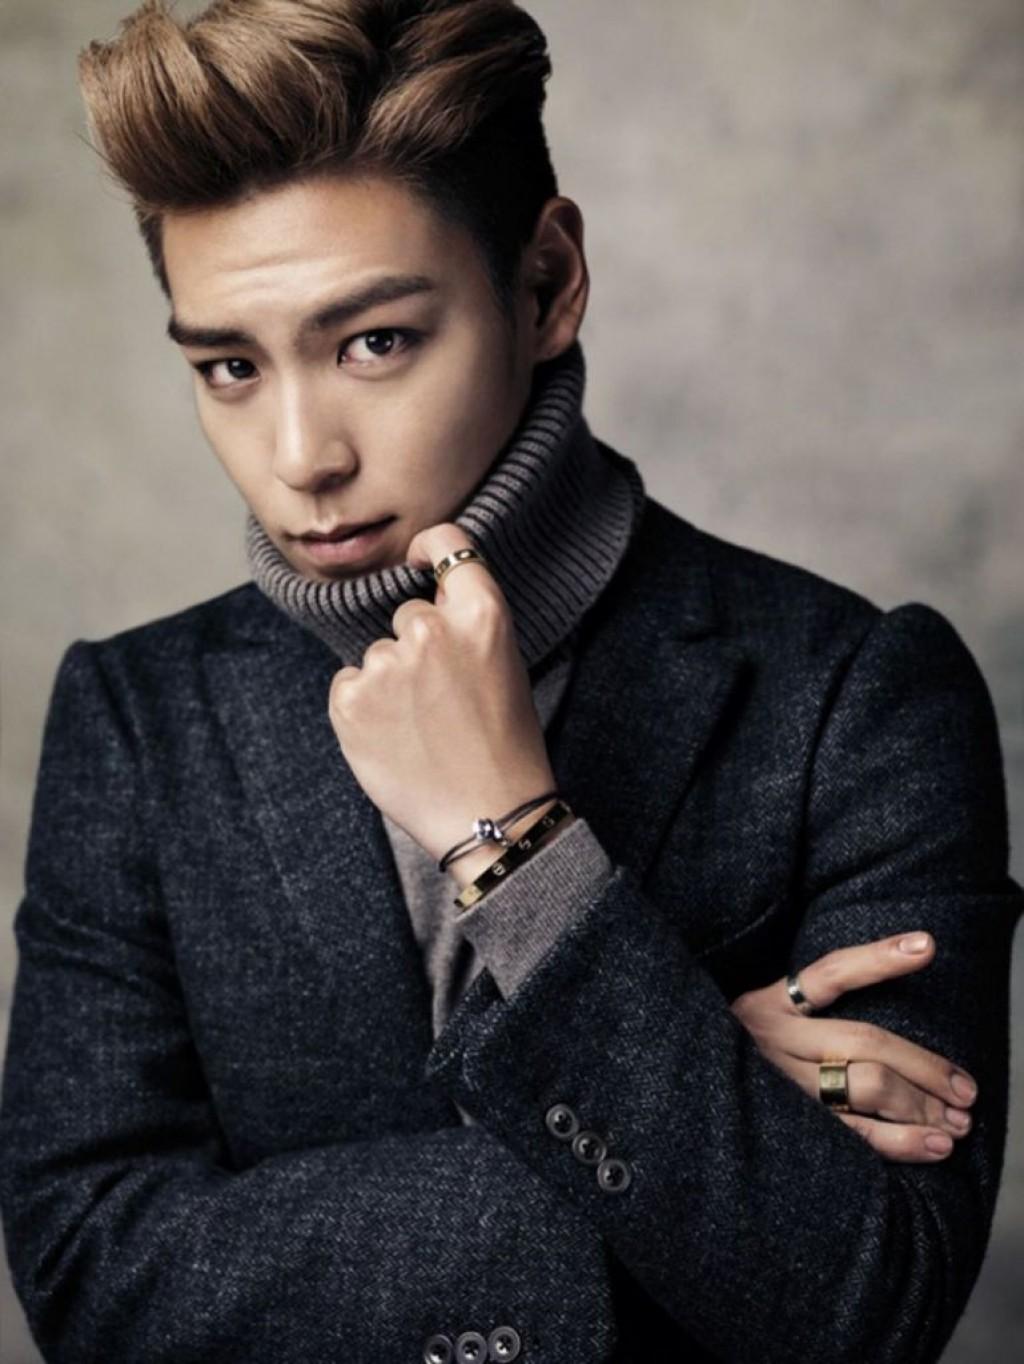 Fabulous Latest Trendy Asian Amp Korean Hairstyles For Men 2015 Bellatory Short Hairstyles Gunalazisus